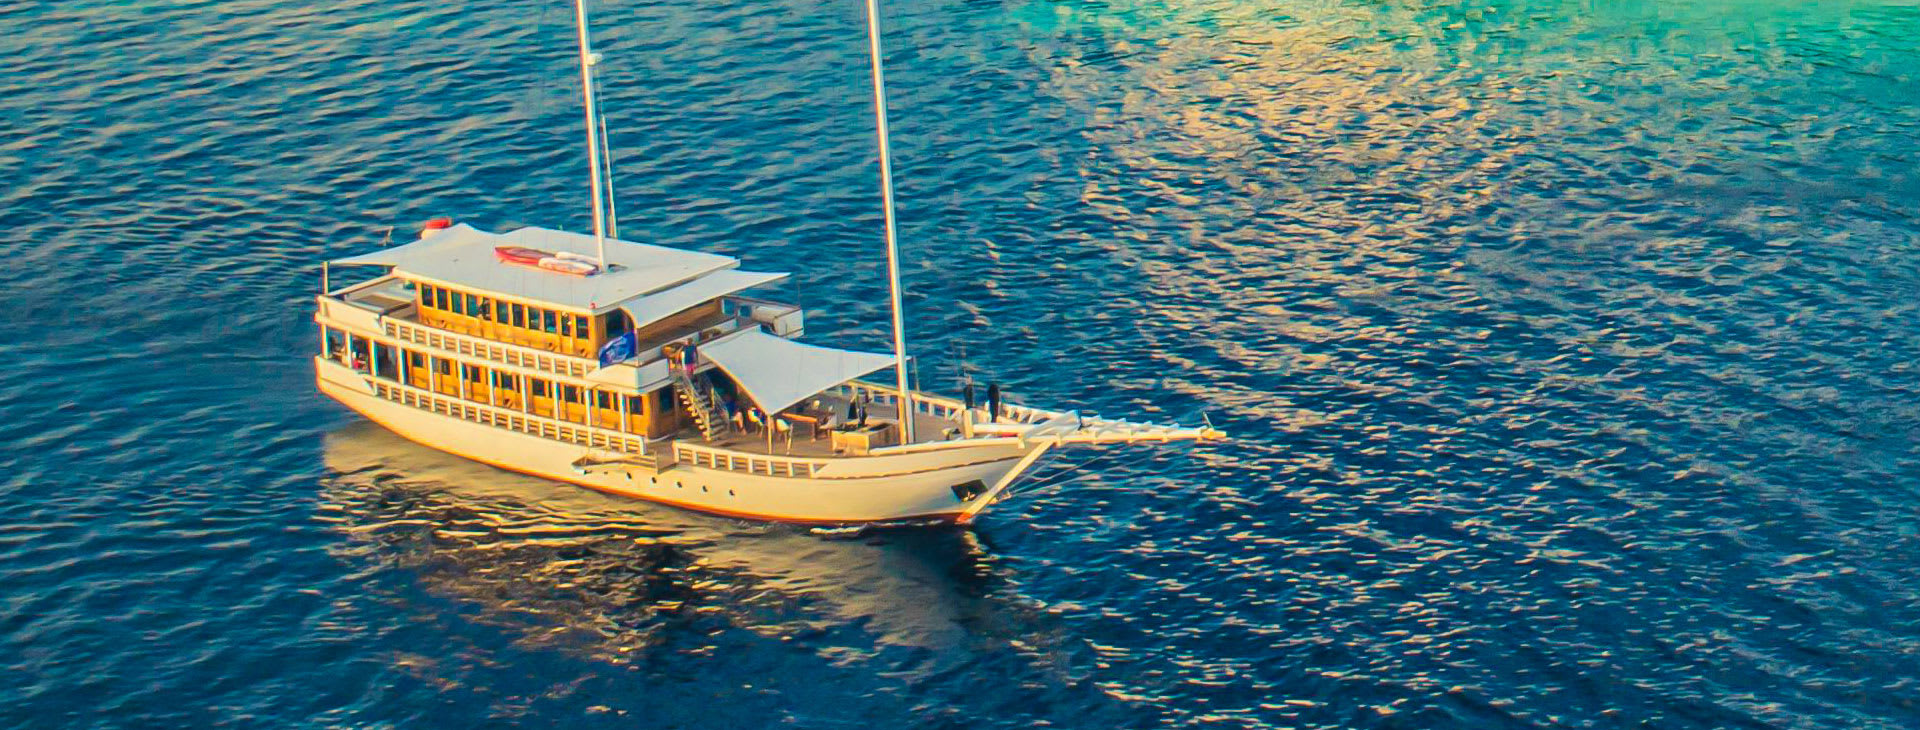 Fenides boat at sea